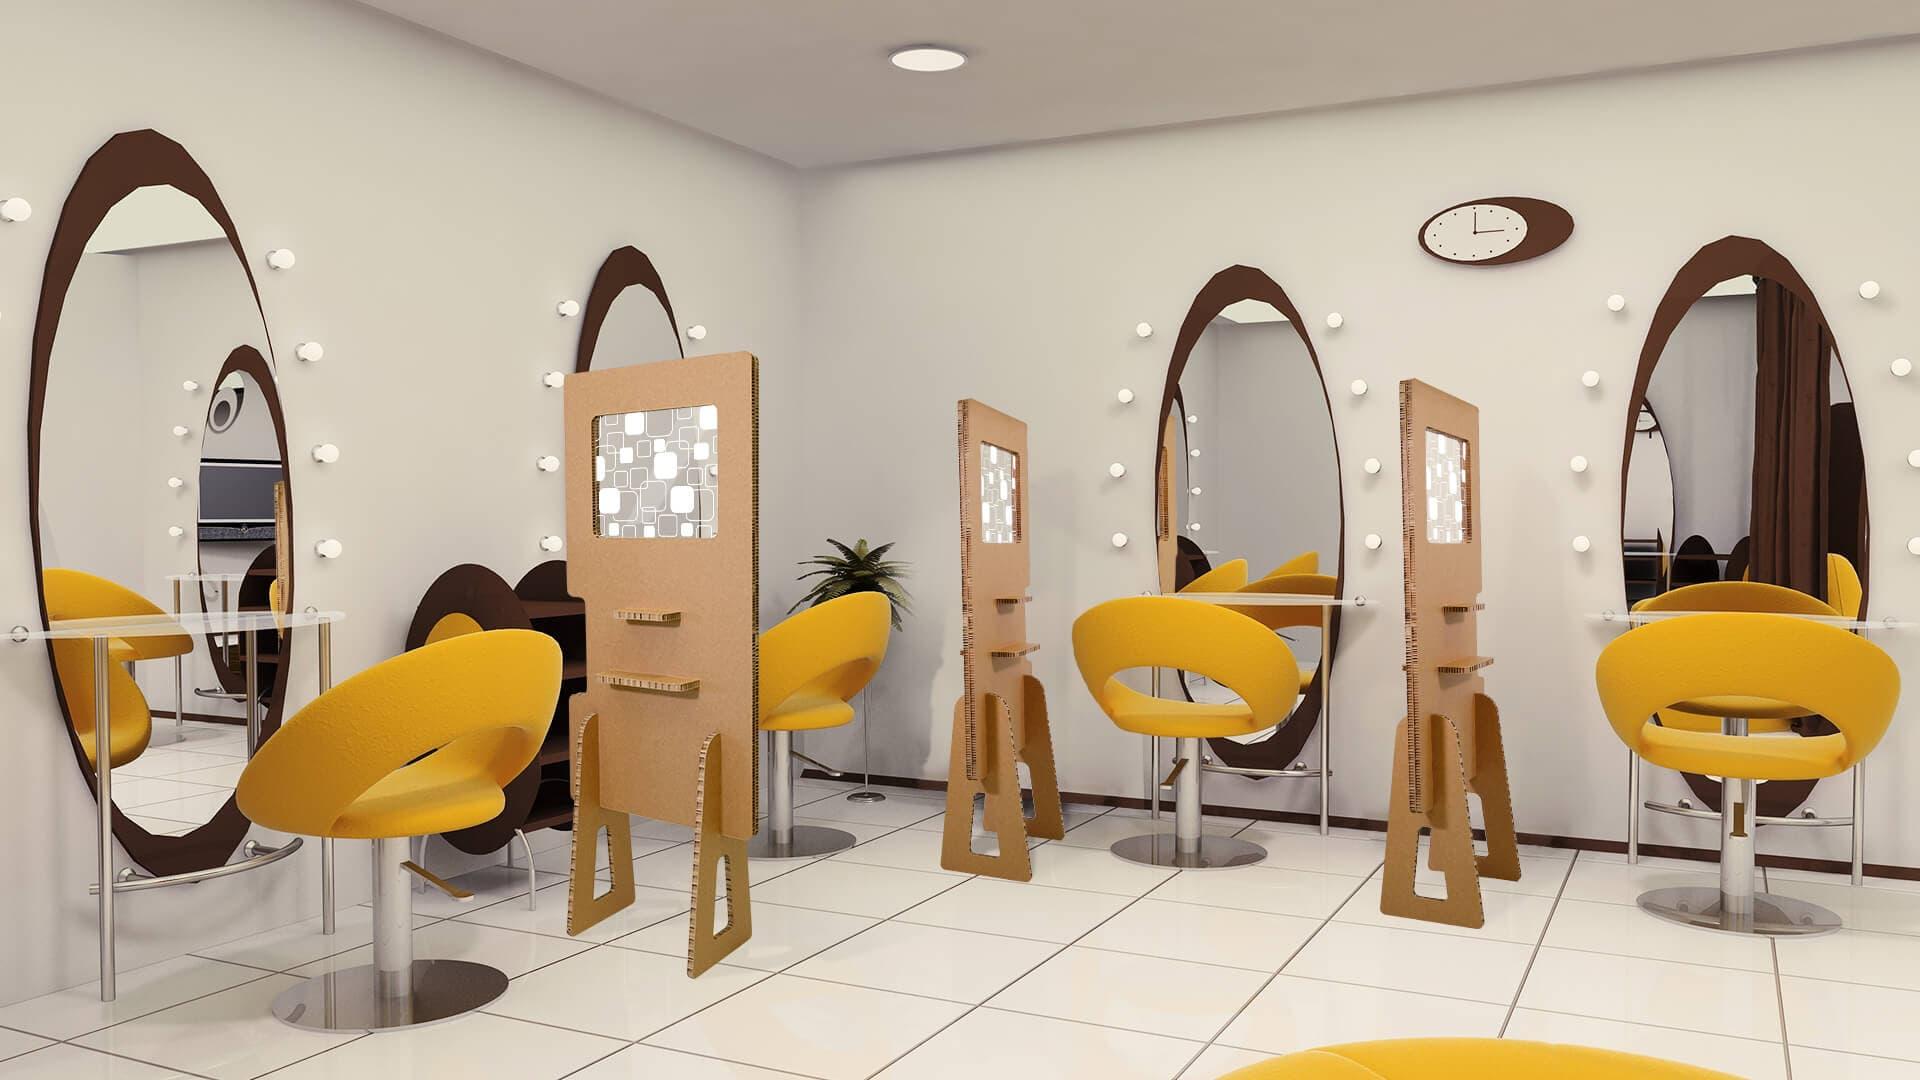 Divisorio in cartone Nidoboard per parrucchieri | tictac.it